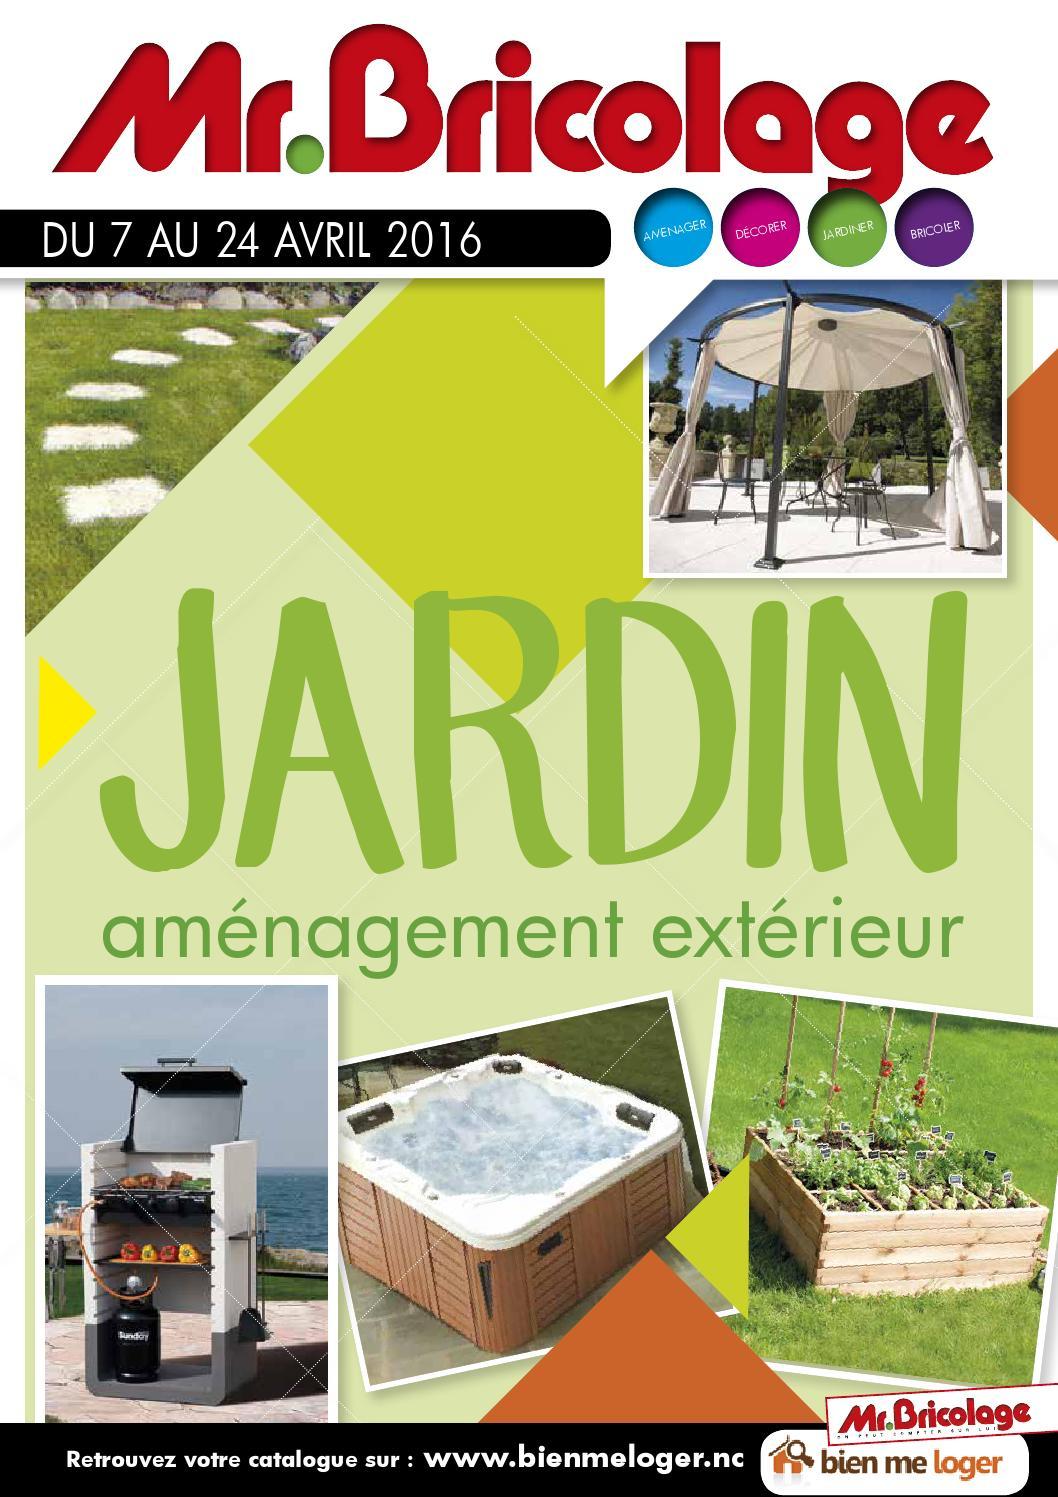 Catalogue Mr Bricolage: Jardin By Skazy - Issuu à Abri Jardin Mr Bricolage